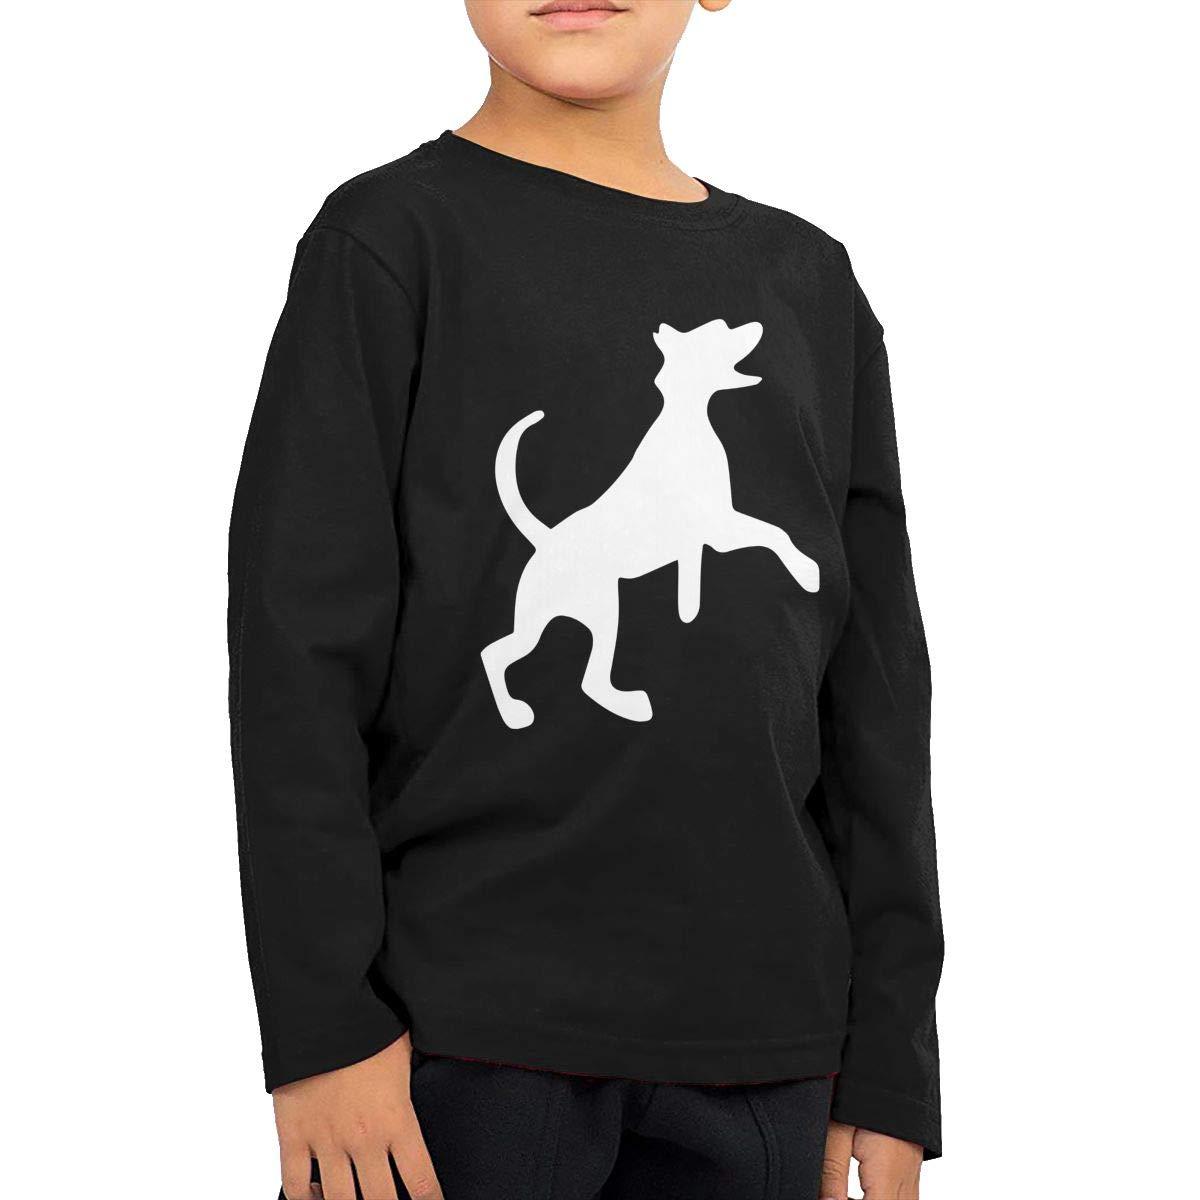 All Black Dog Cartoon Kids Boys Girls O-Neck Long Sleeve Shirt Tee for Toddlers